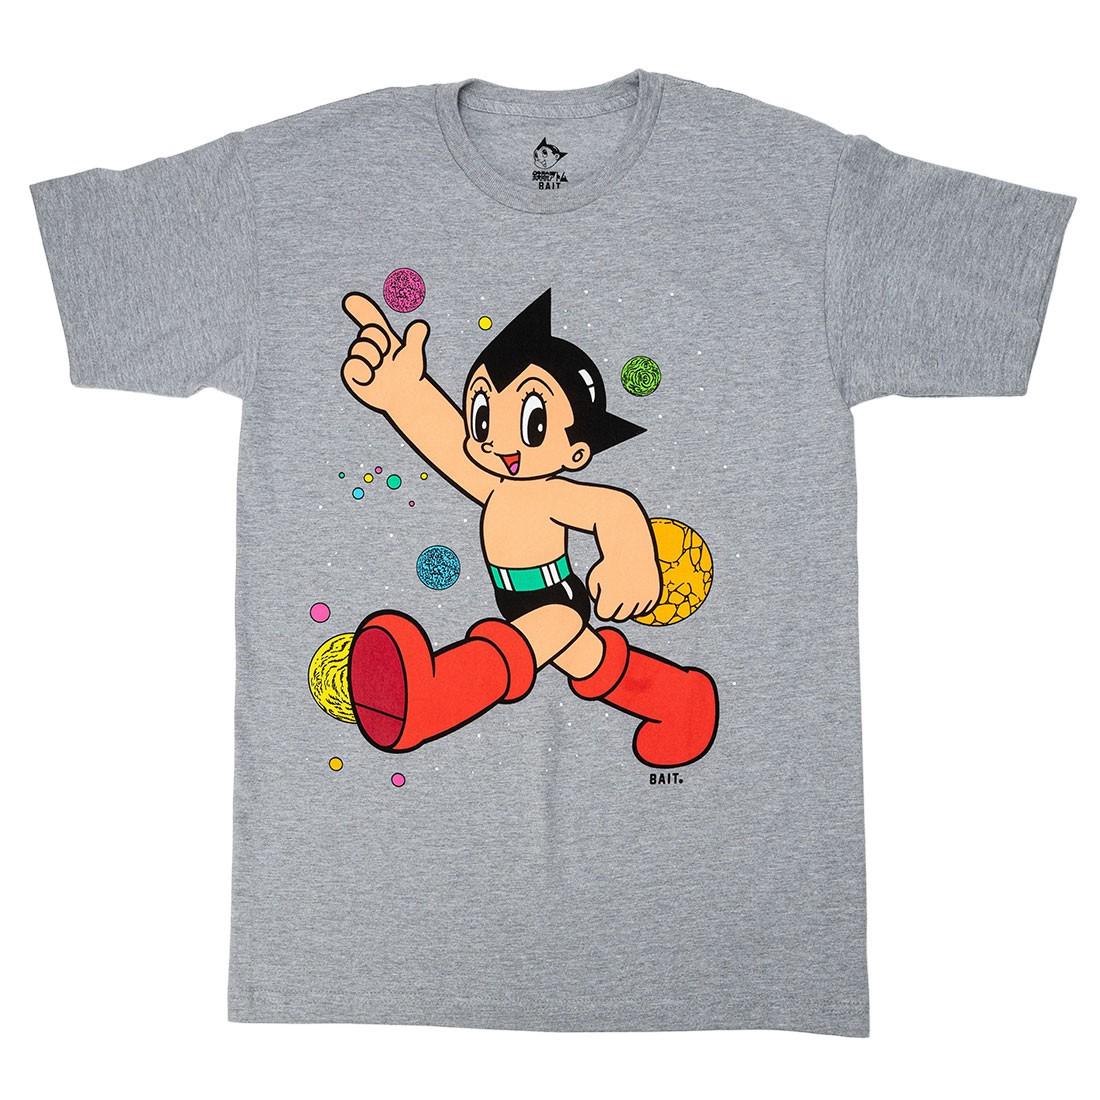 BAIT x Astro Boy Men Space Puff Print Tee (gray)